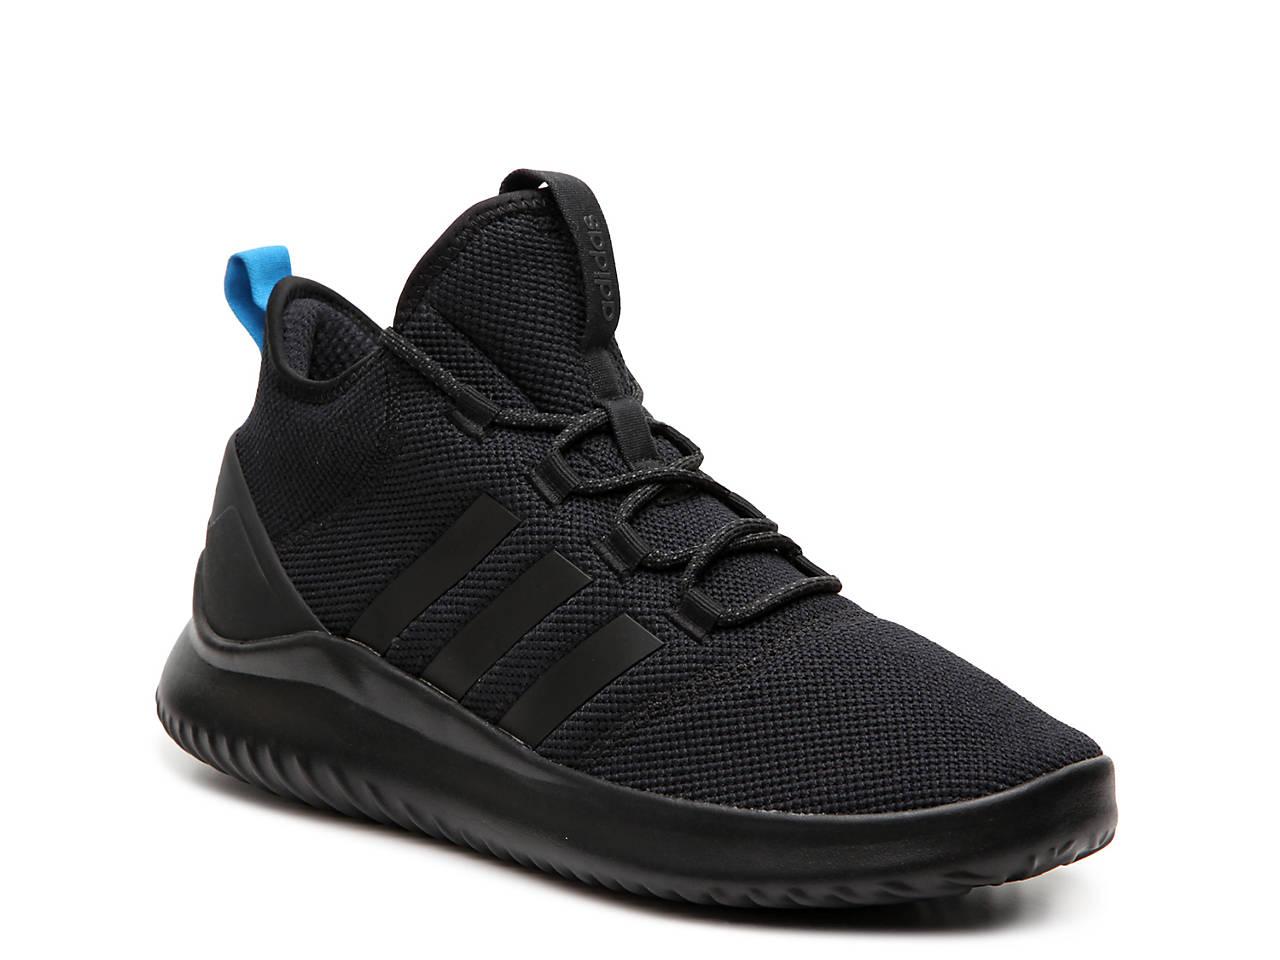 huge discount 918a6 b1216 adidas. Cloudfoam Ultimate BBALL High-Top Sneaker - Men s